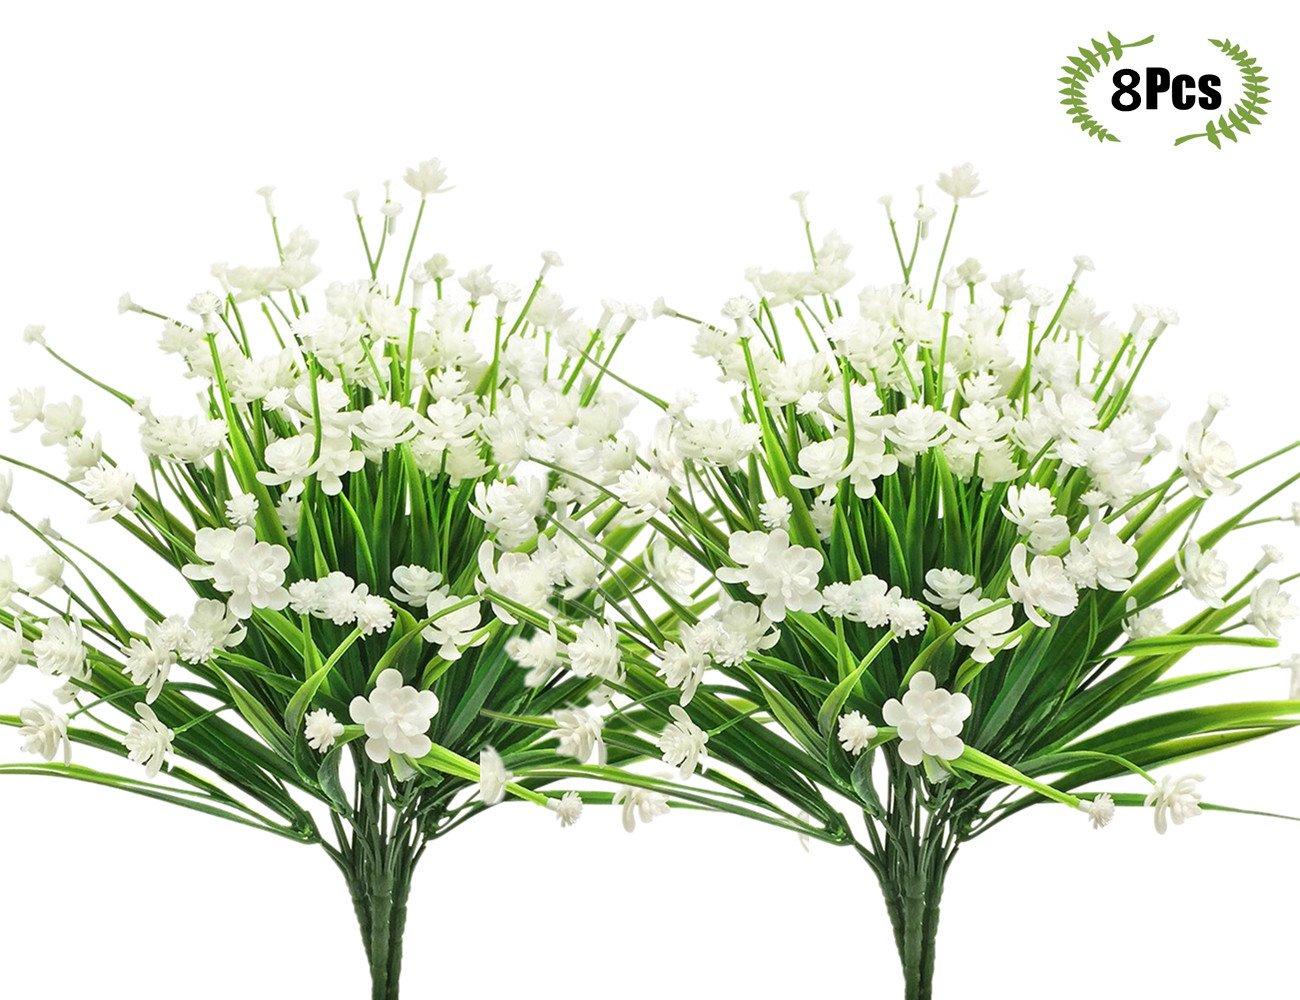 lovenimen人工椿の花、プラスチックDaffodilsフェイク植物ウェディングブライダルブーケパーティーインドアアウトドアDIYホームガーデンベランダコリドーテーブルセンターピースArrangements装飾 B07CWNSRDV  Camellia/White/8pcs